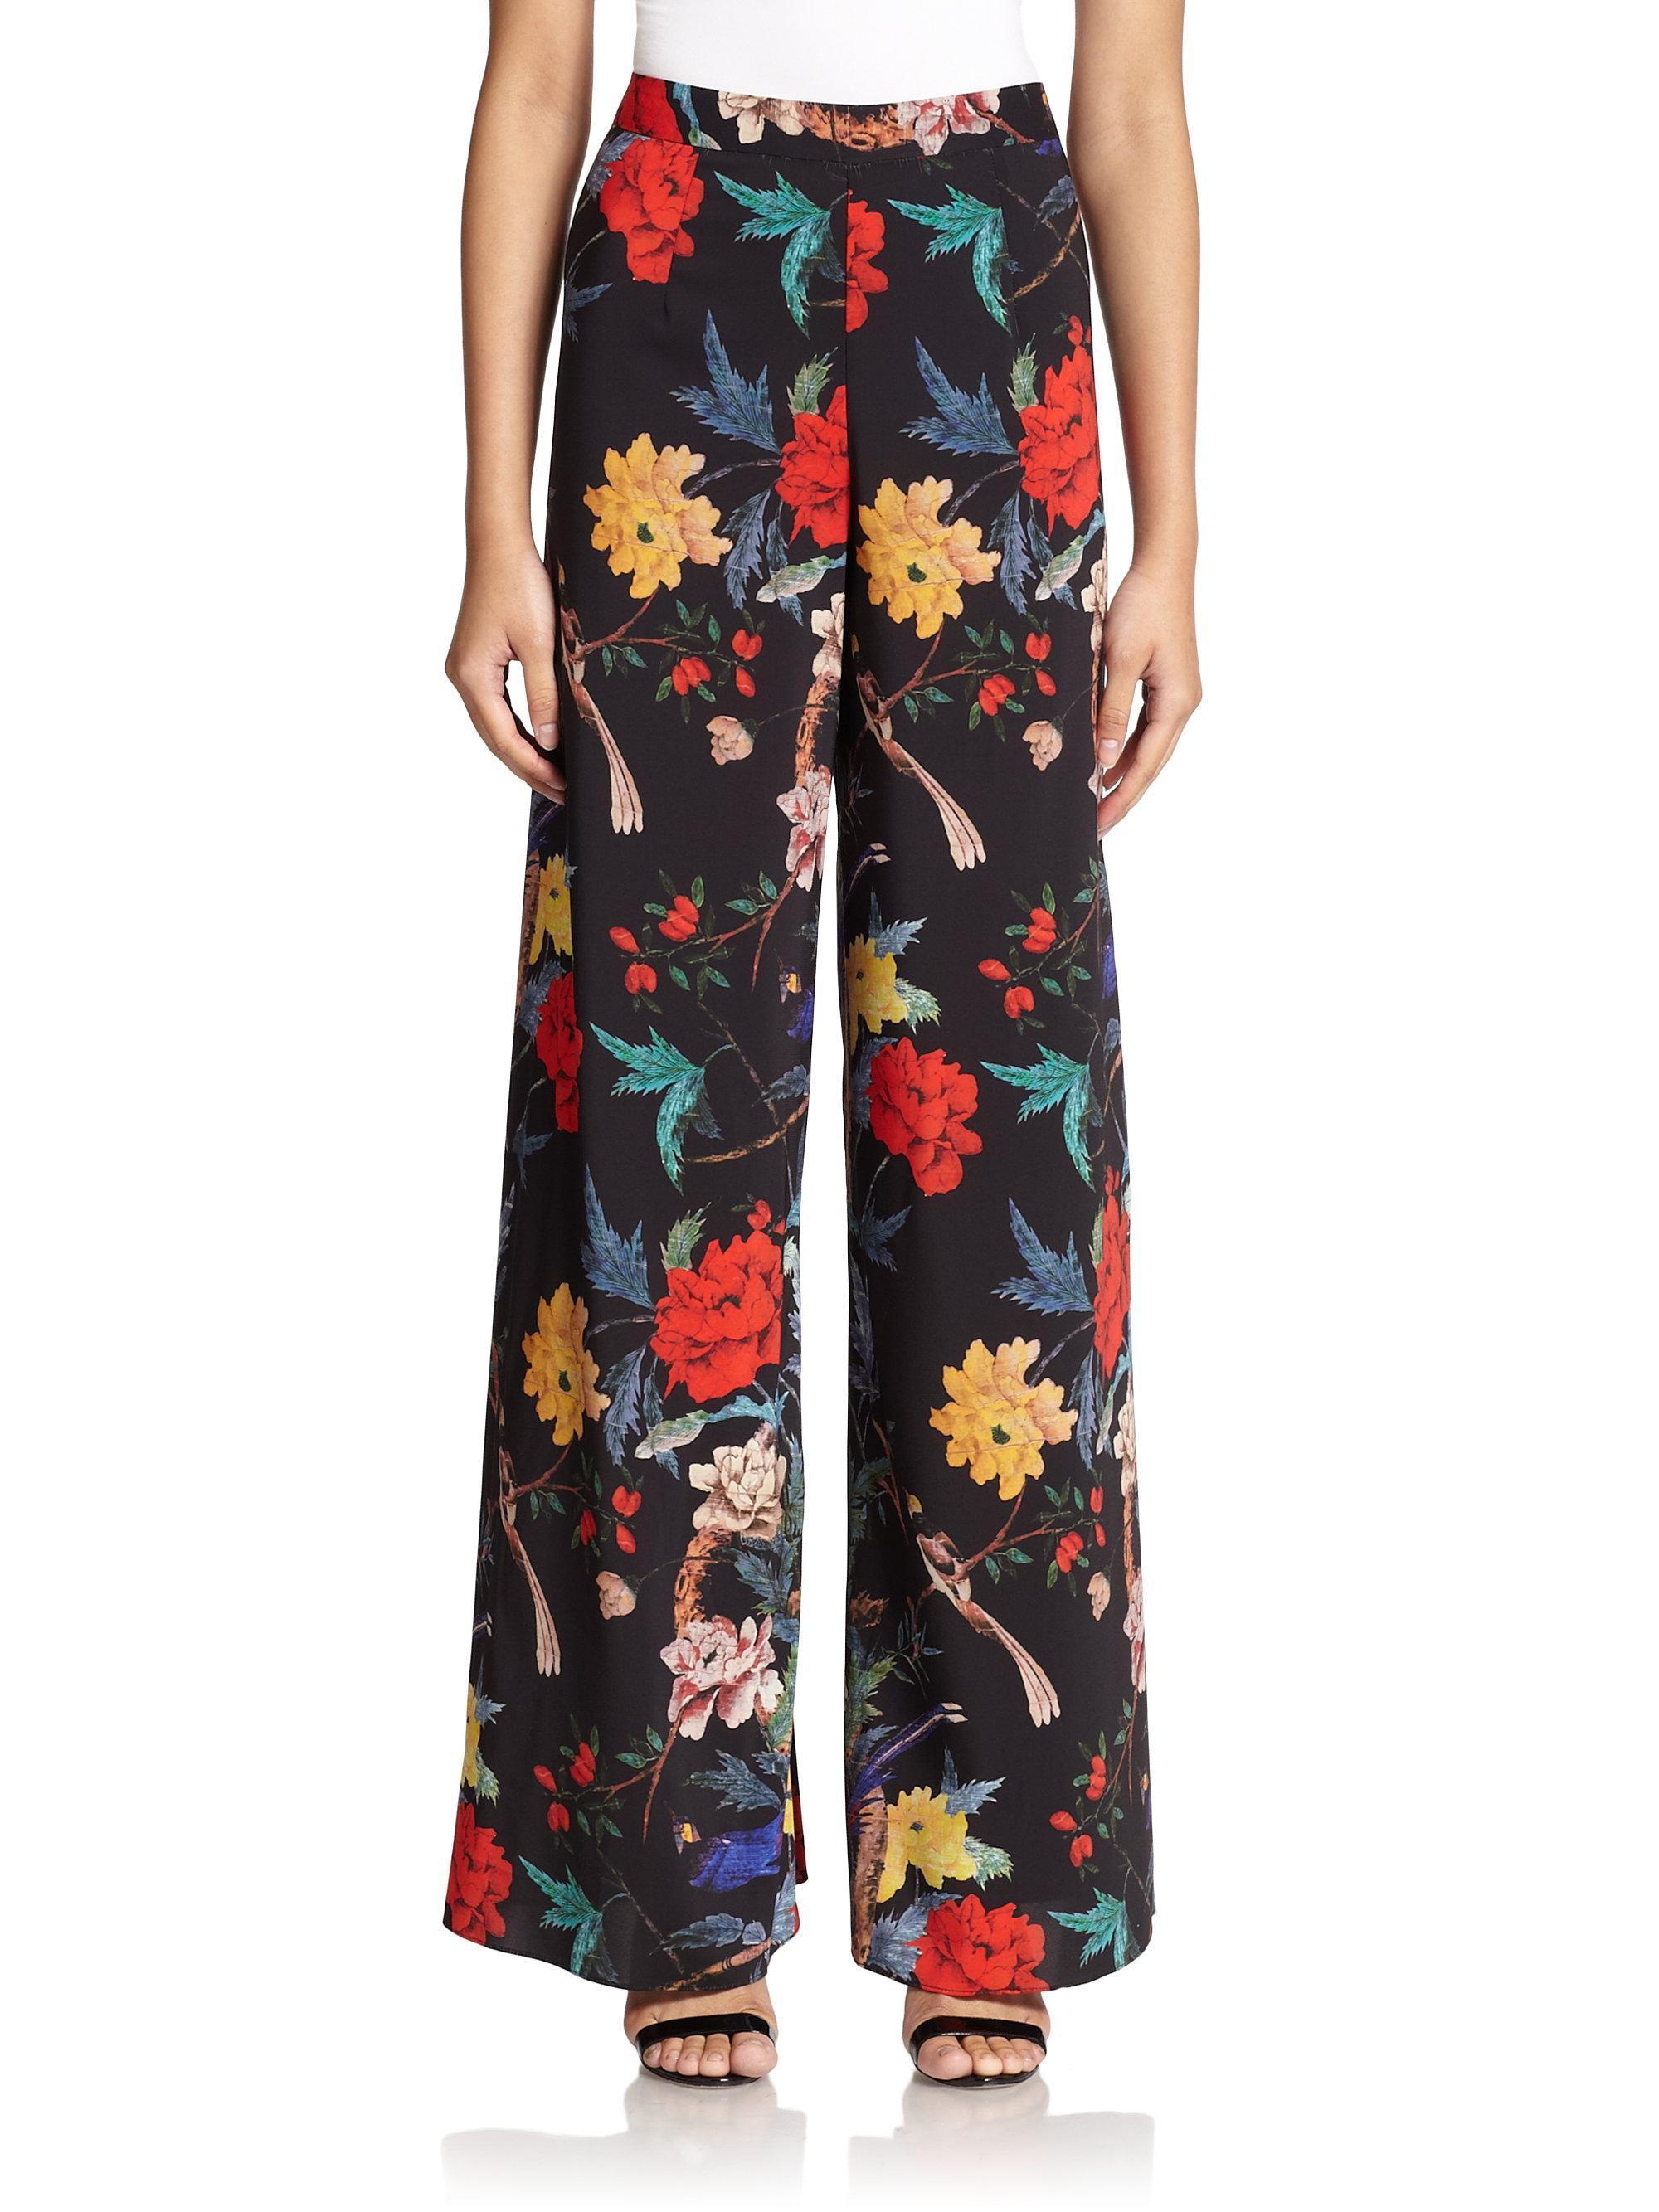 Lela Rose Maggie High-Waist Wide-Leg Floral-Print Pants Details Lela Rose